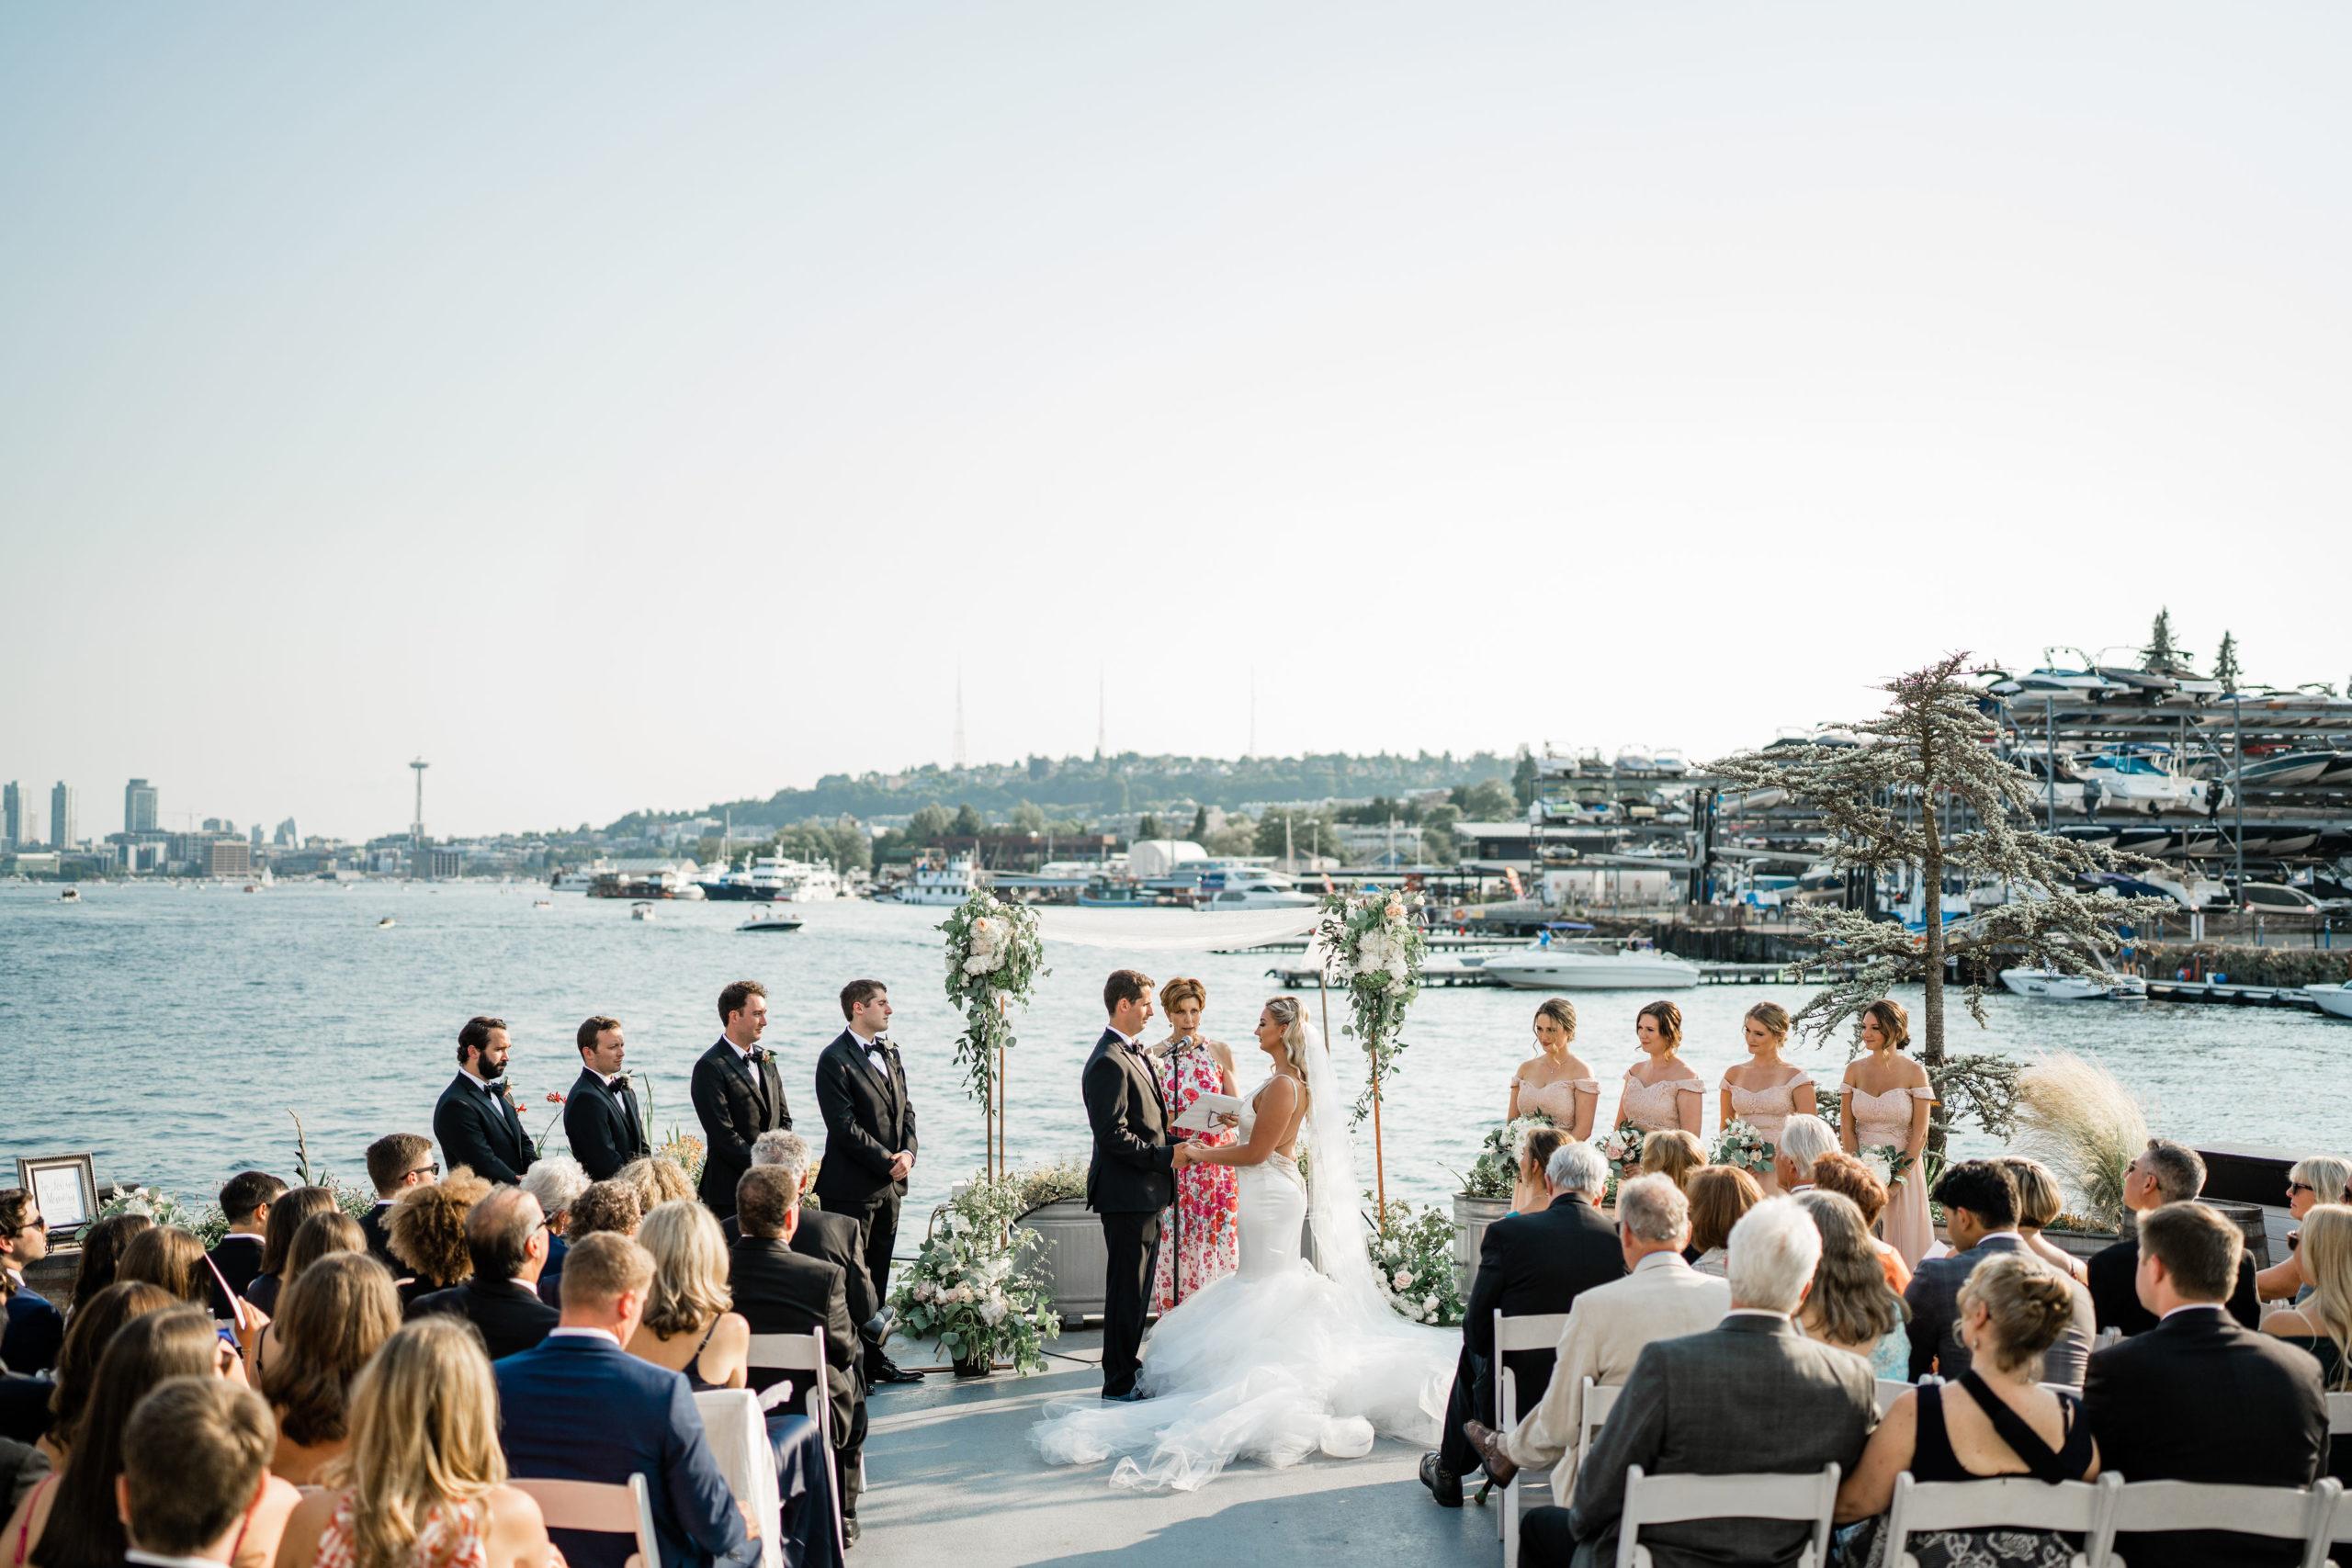 guests watch bride and groom get married